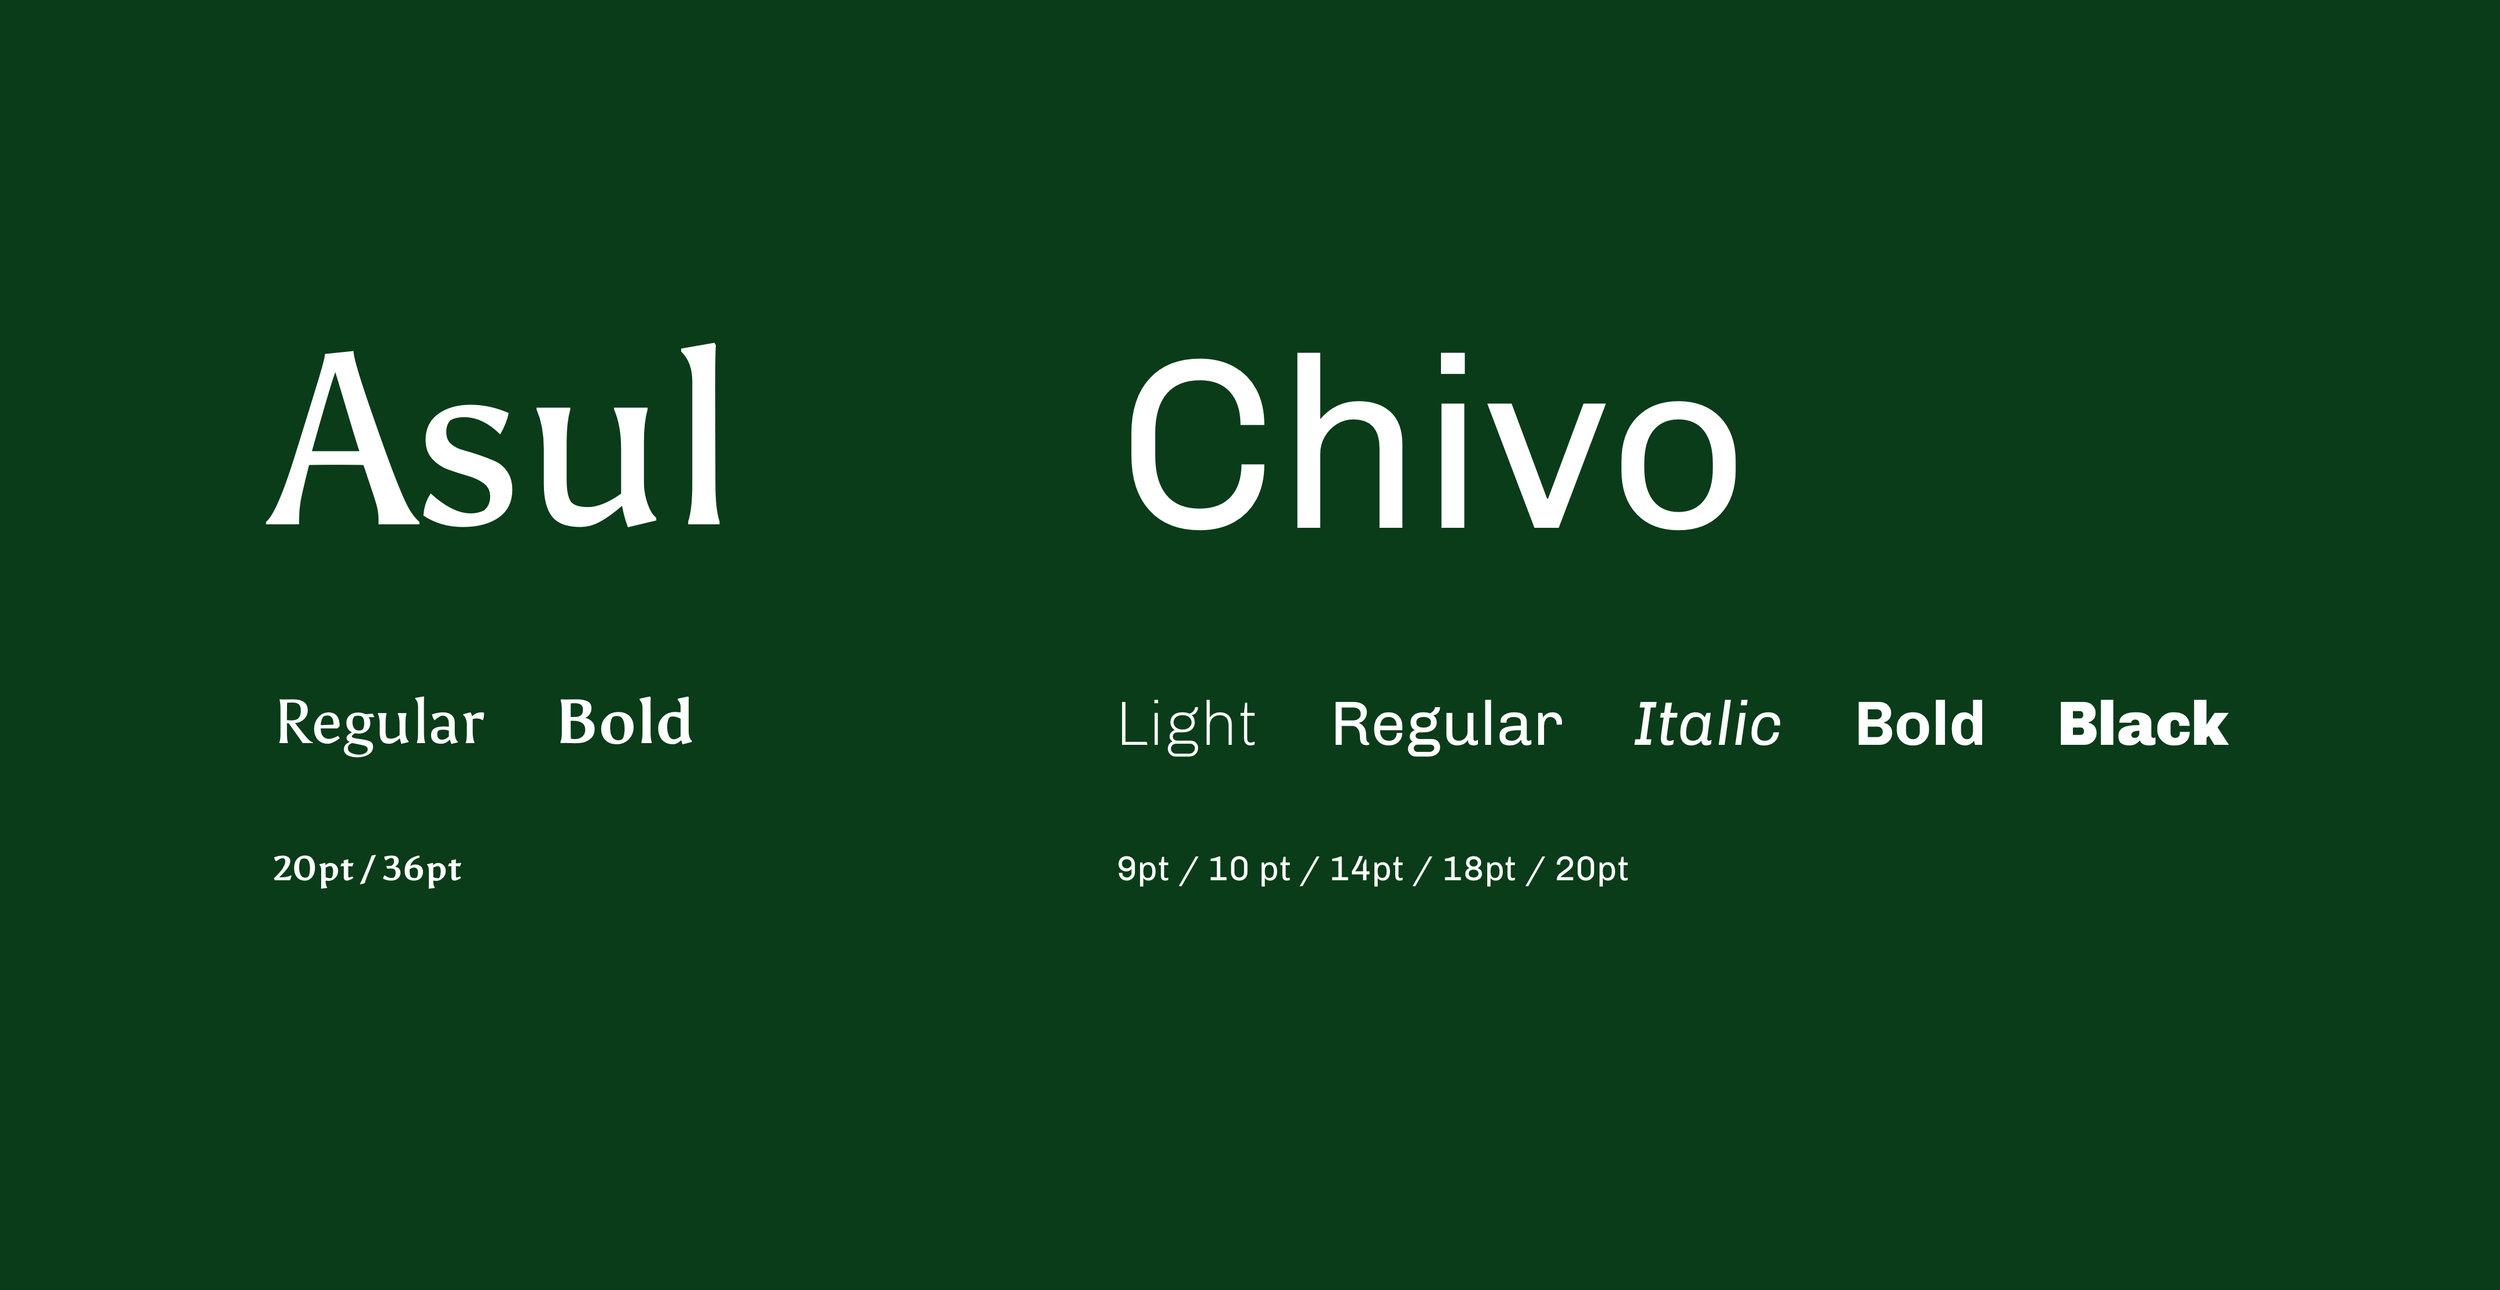 Typography@3x.jpg